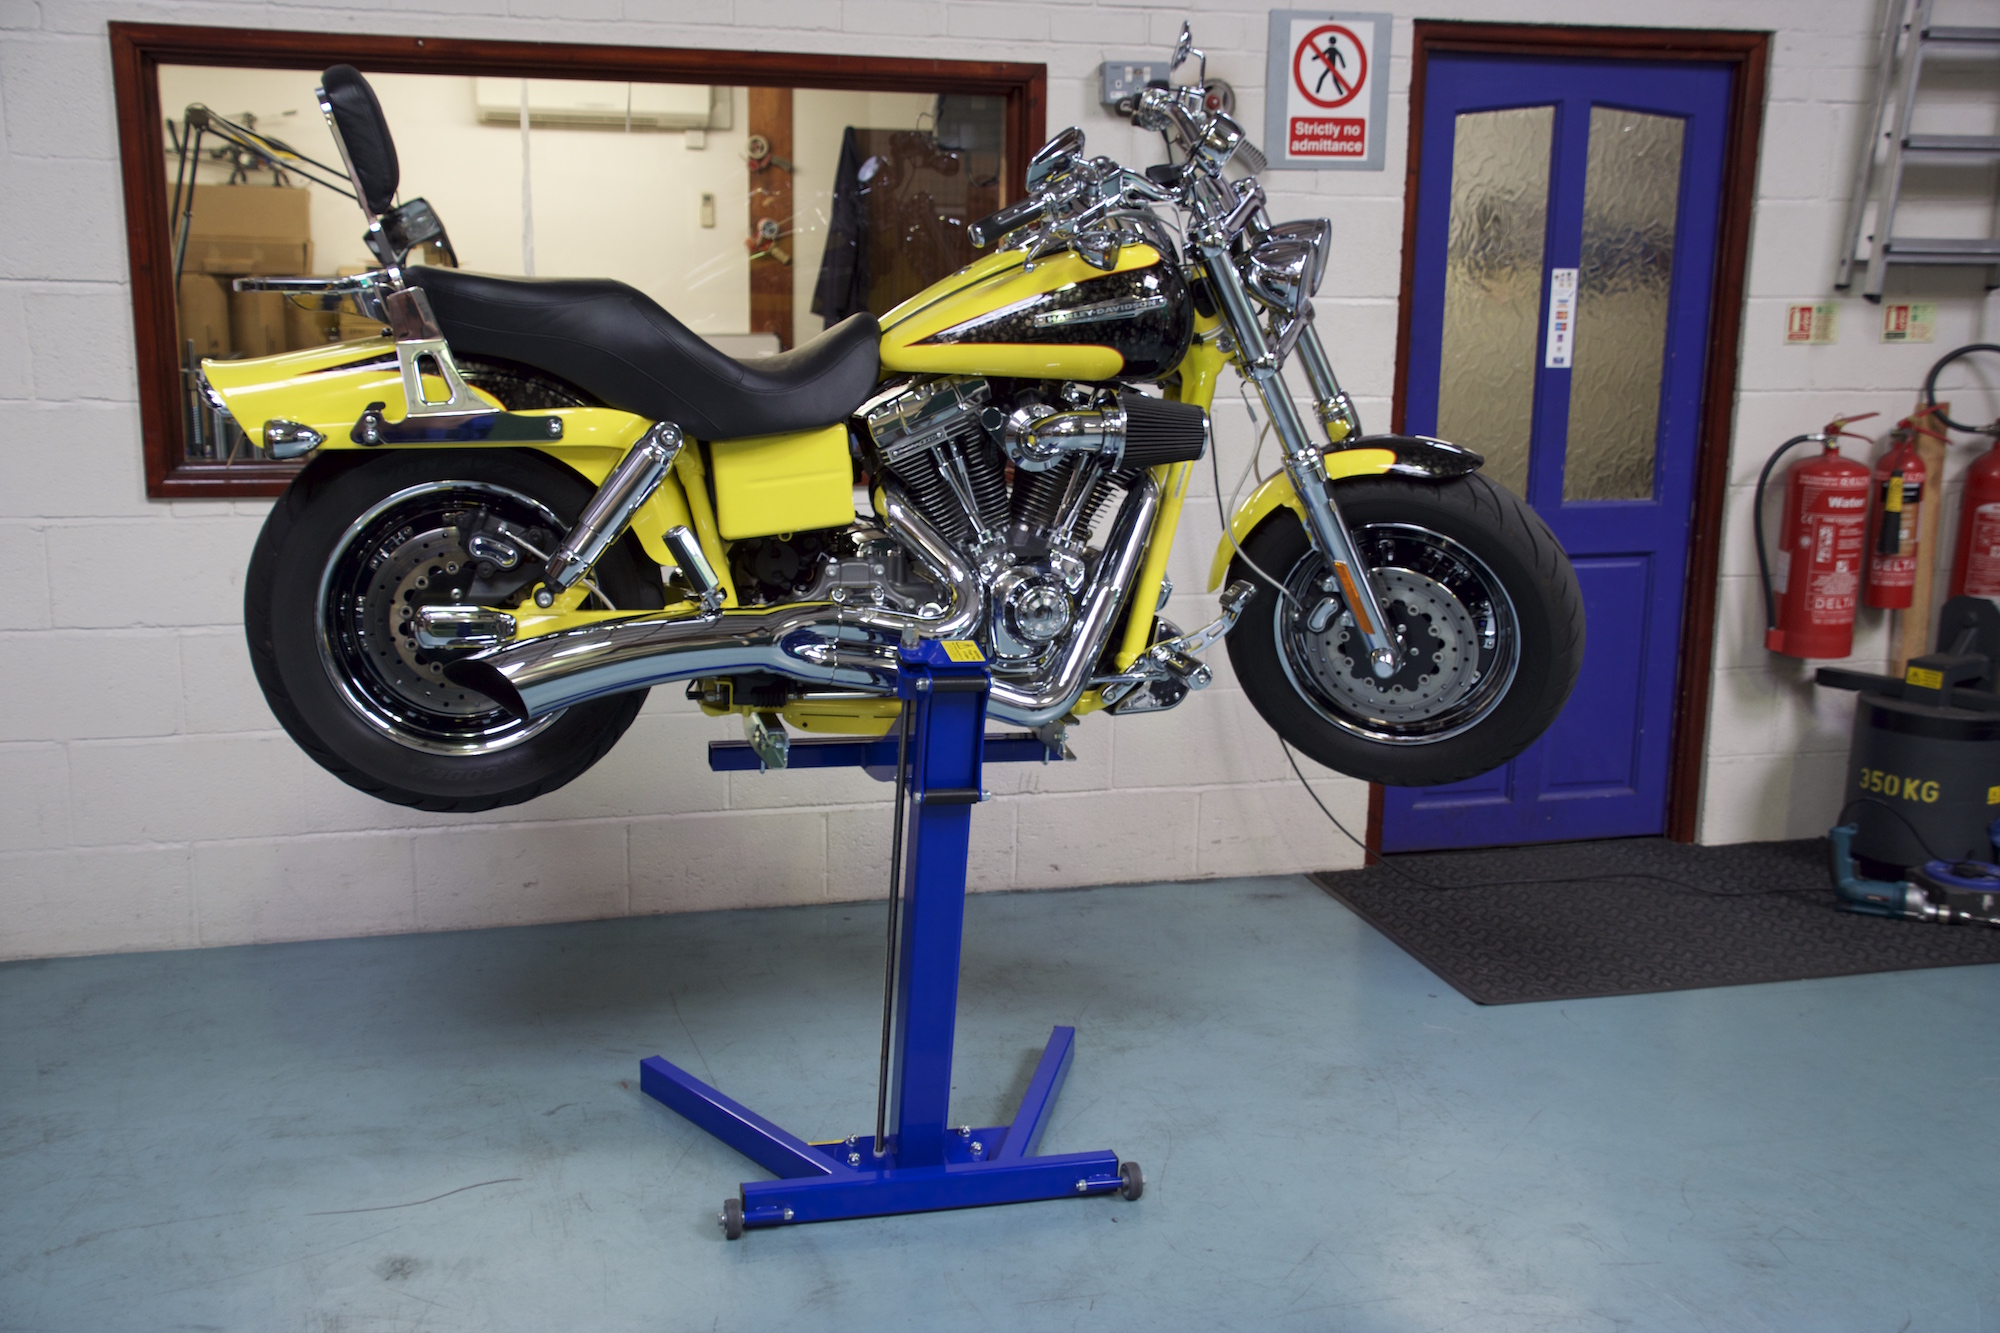 Harley Davidson Lift Motorcycle Lift Stand Eazyrizer